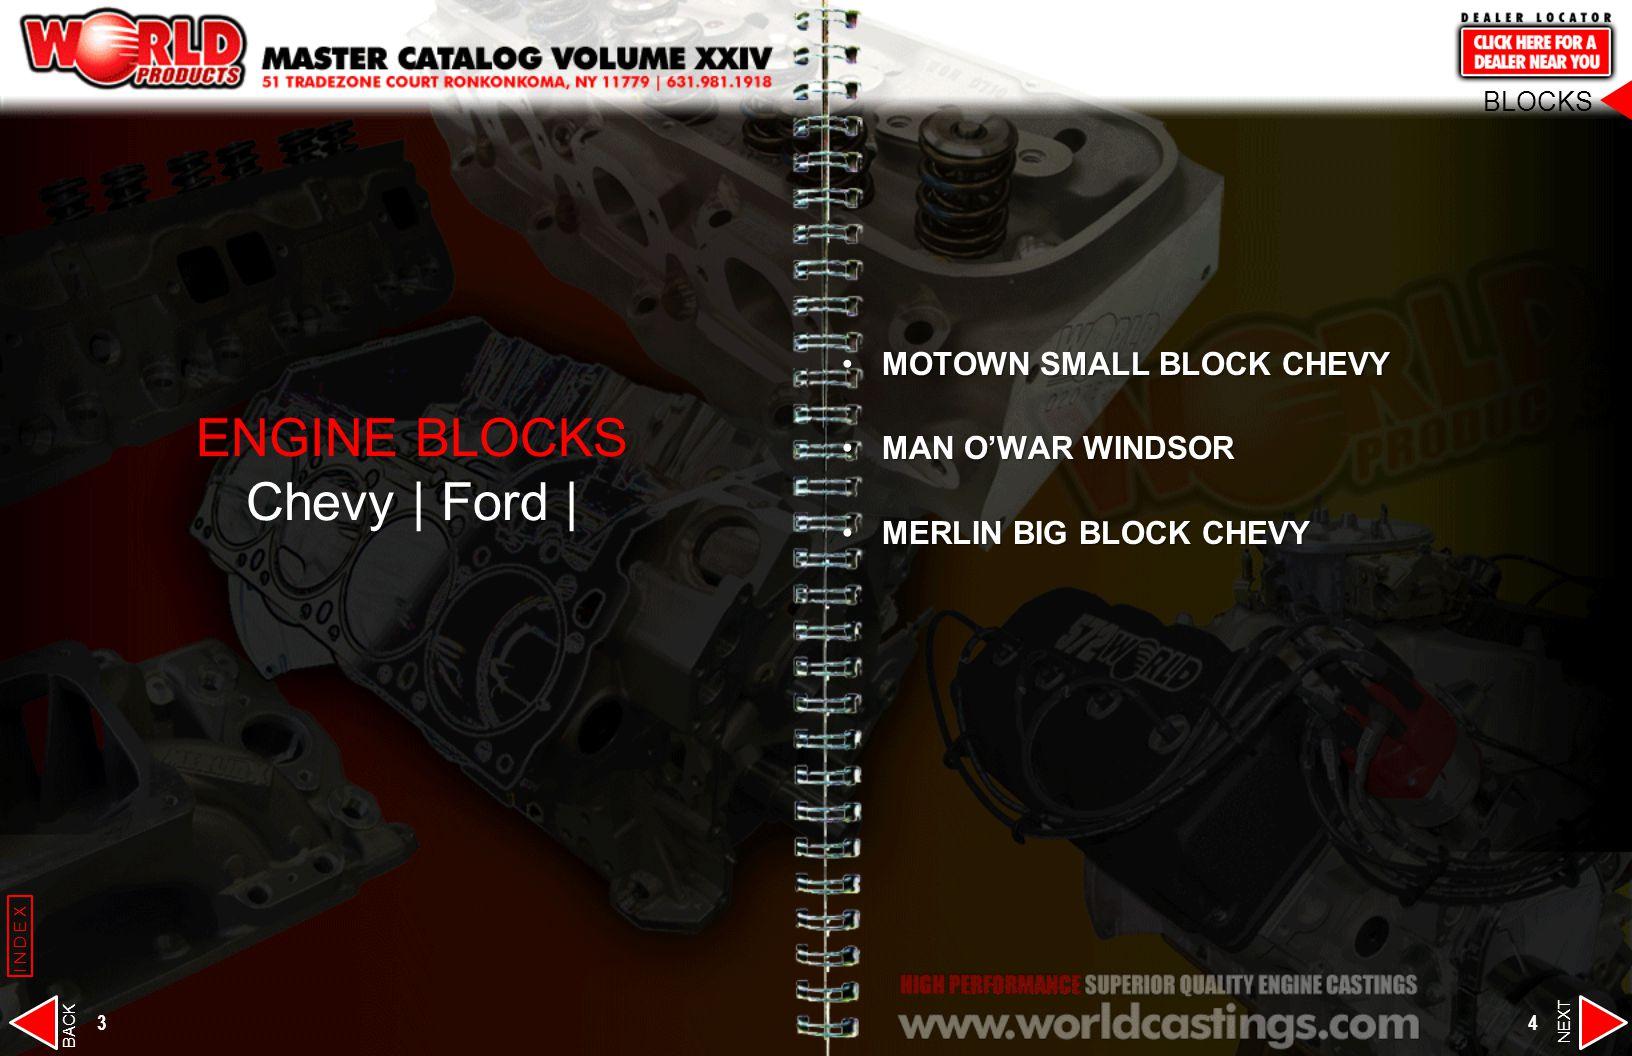 ENGINE BLOCKS Chevy | Ford |